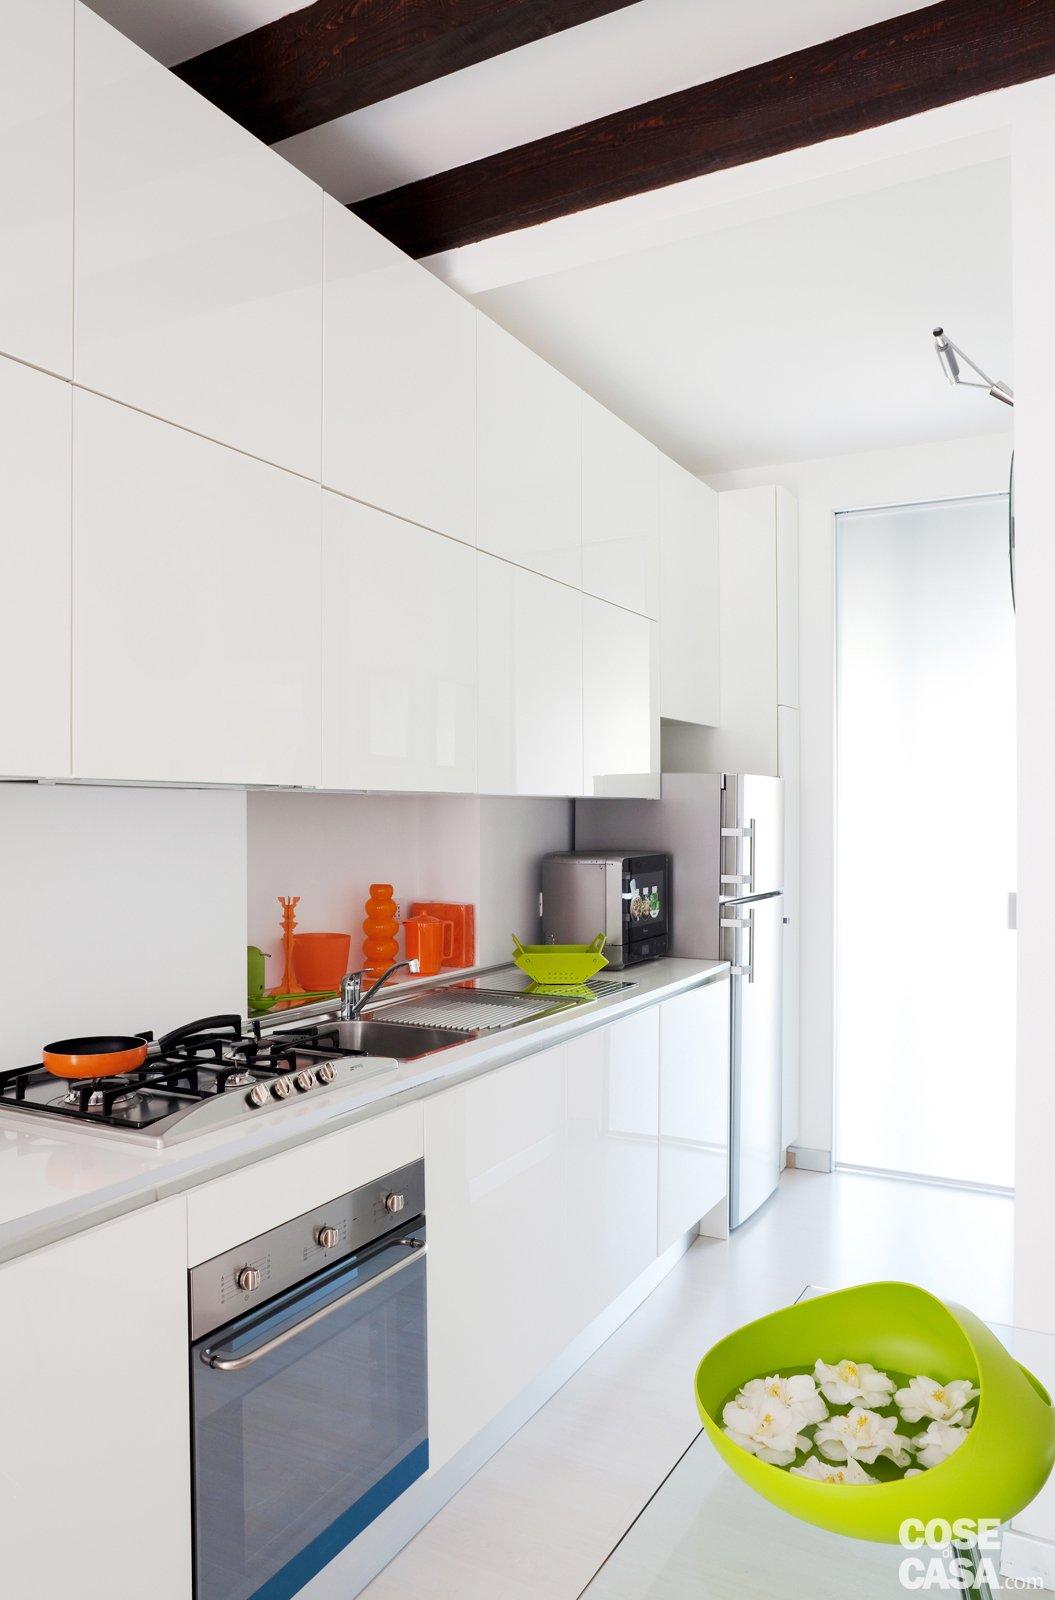 Una casa di 35 mq sfruttati al massimo cose di casa - Cucina in casa ...